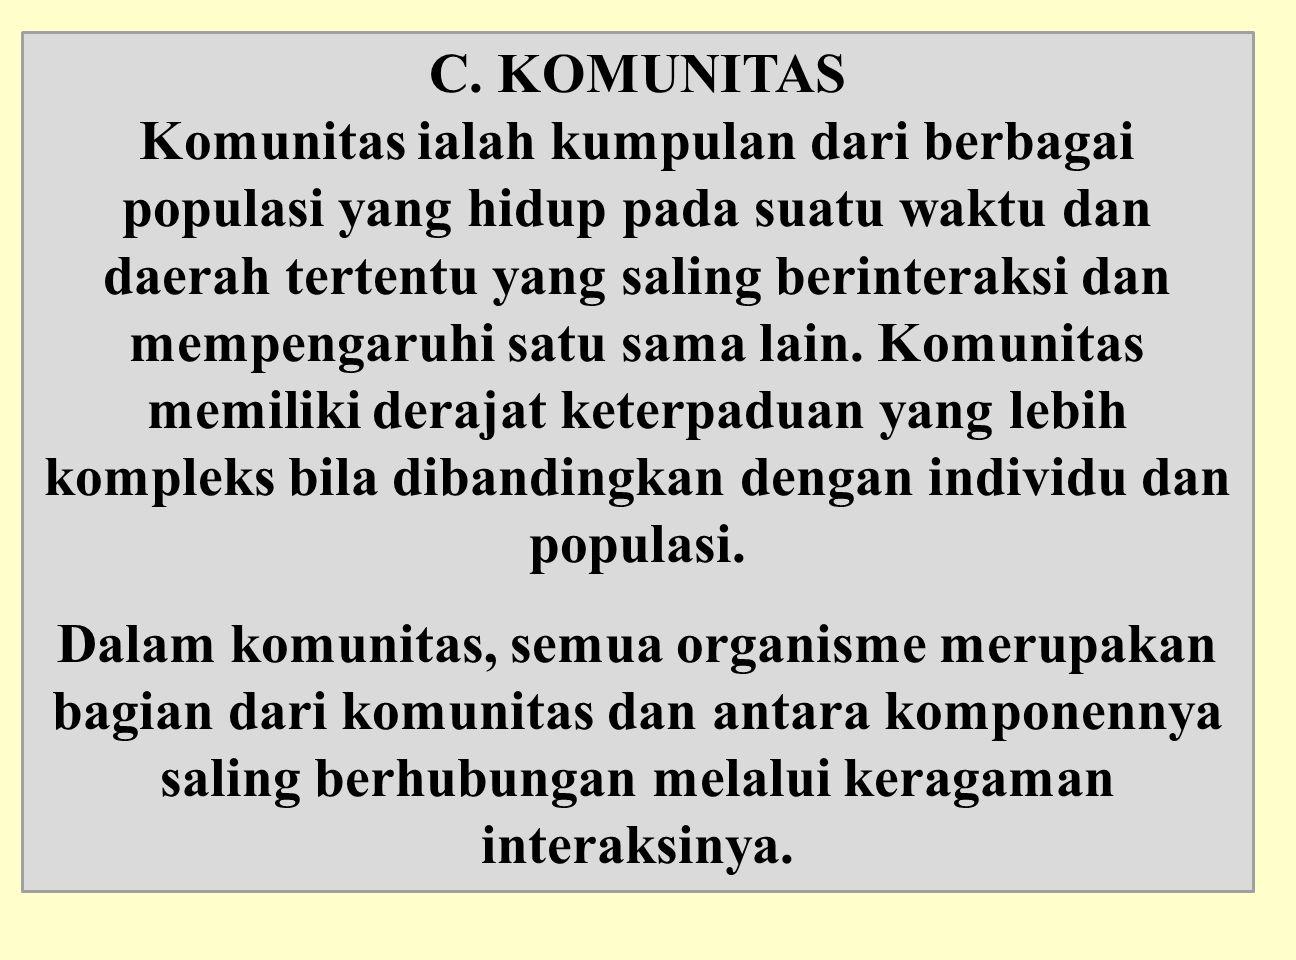 C. KOMUNITAS Komunitas ialah kumpulan dari berbagai populasi yang hidup pada suatu waktu dan daerah tertentu yang saling berinteraksi dan mempengaruhi